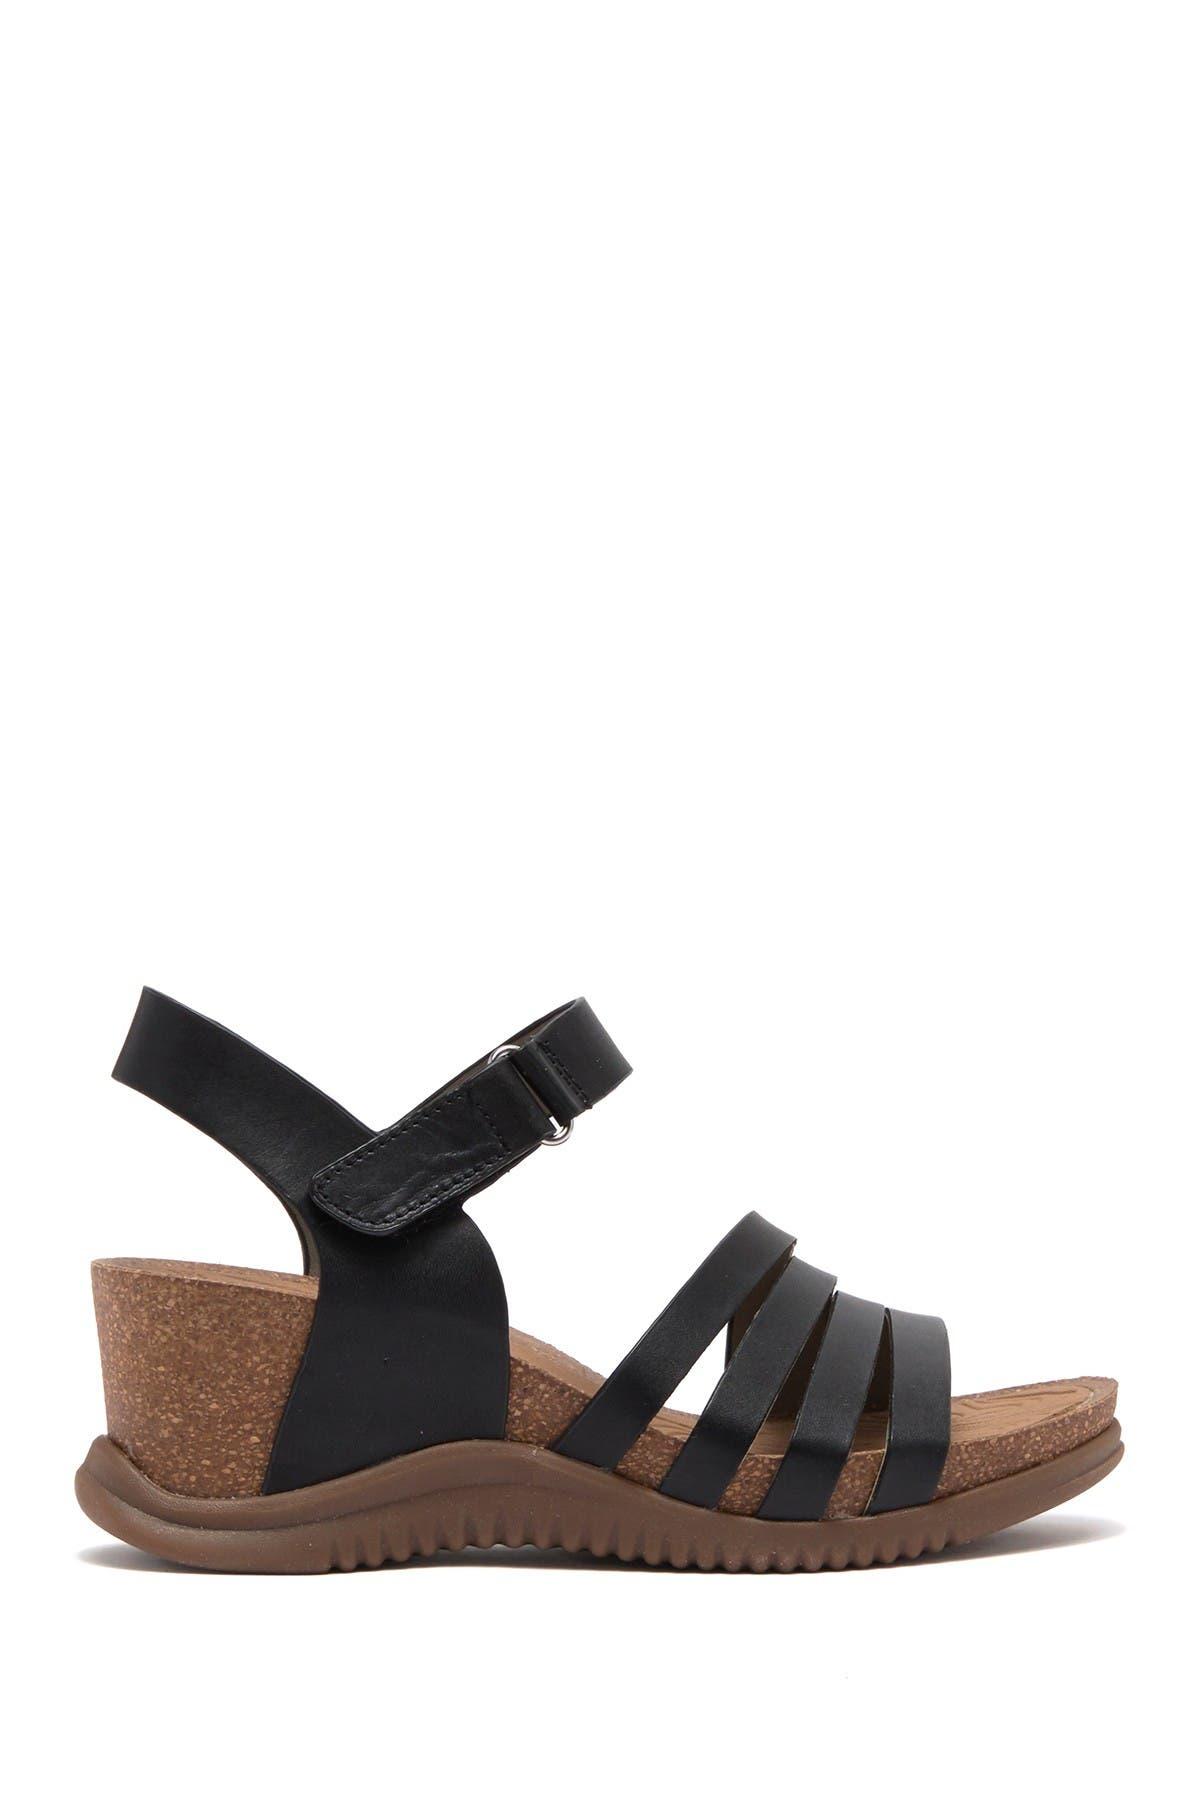 Image of bionica Palladium Leather Wedge Sandal